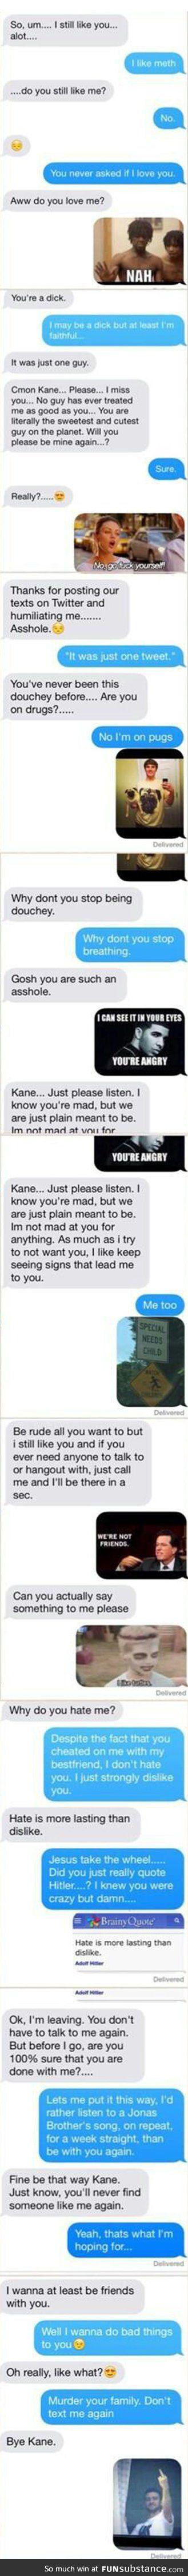 How to deal with a b*tch ex-gf.. this is so cool